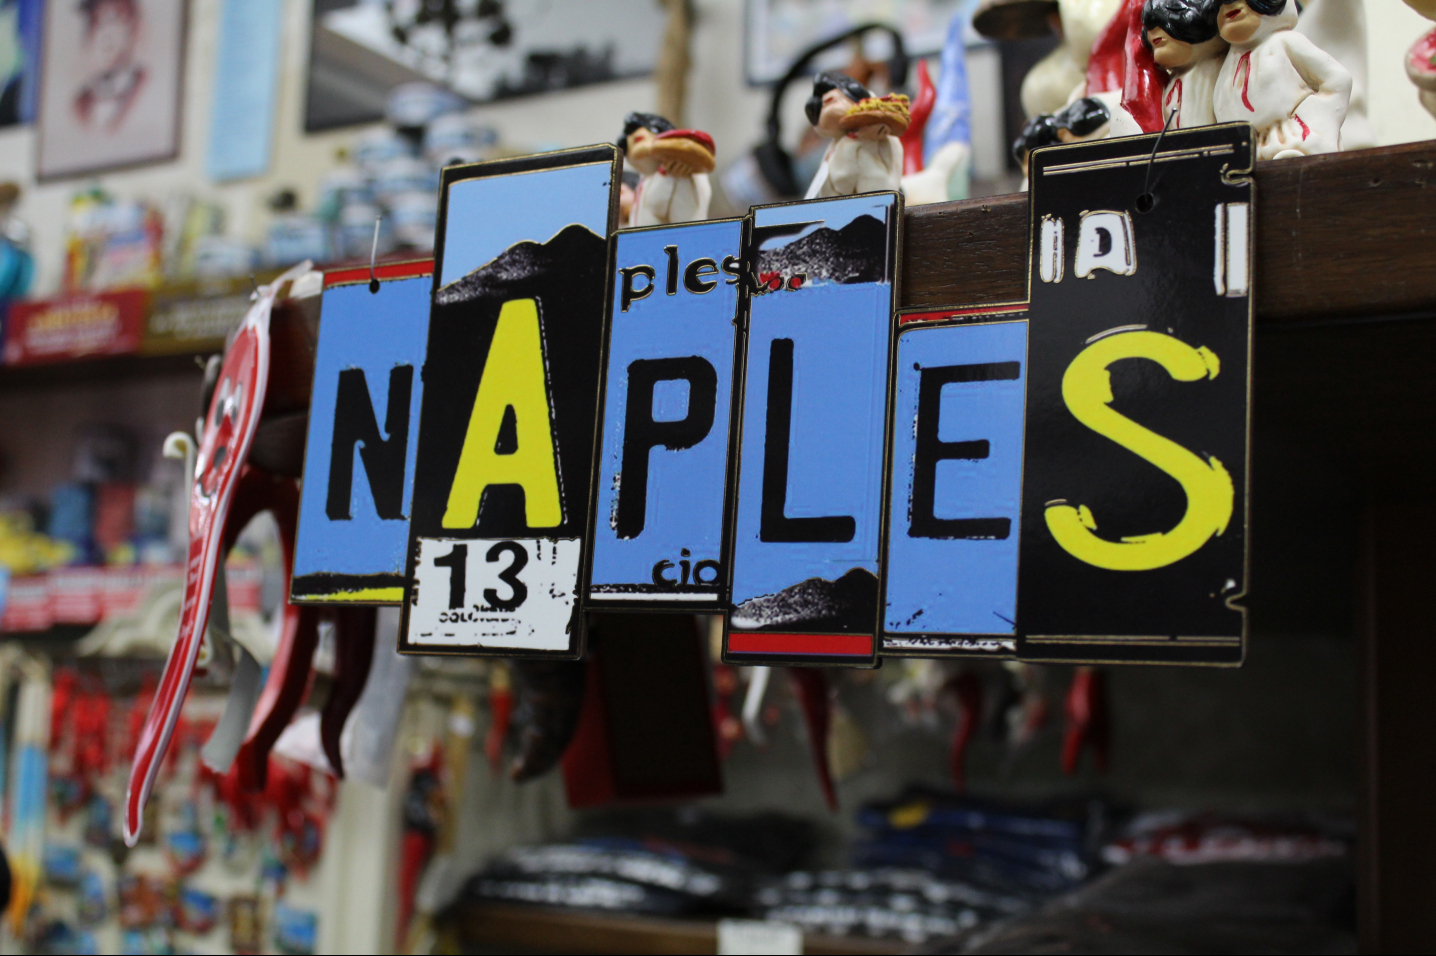 Naples - CC unsplash